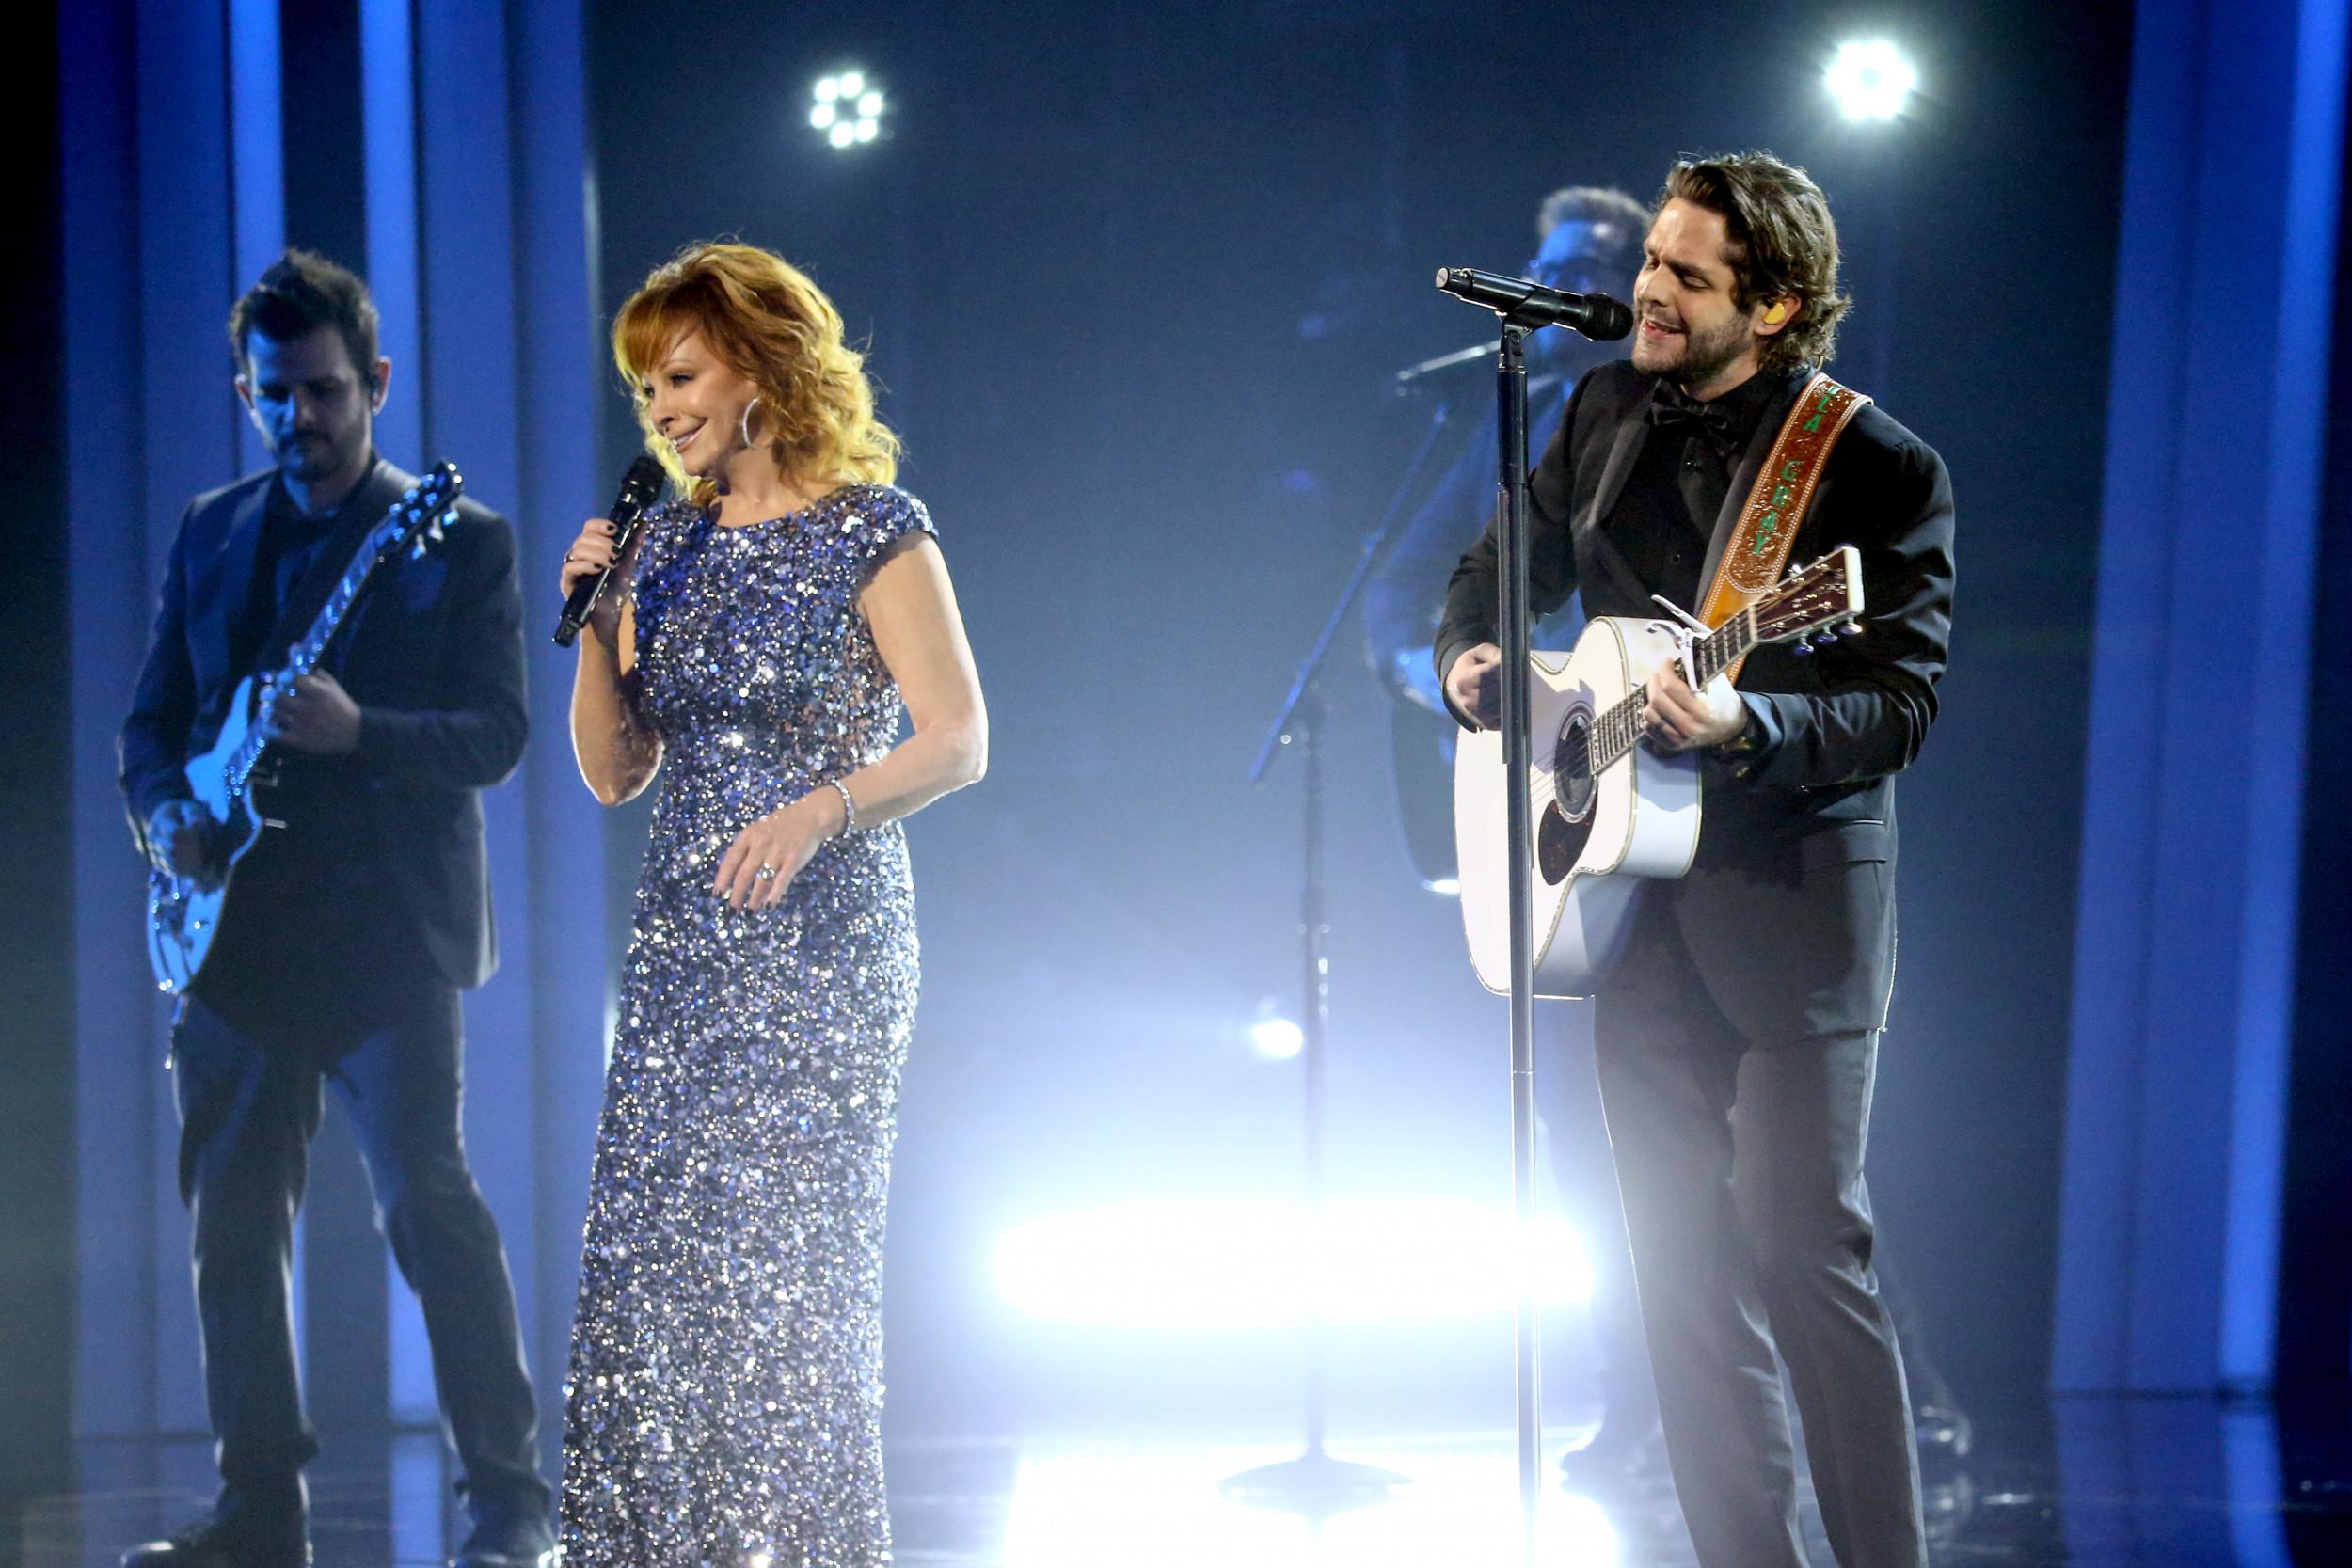 Who took home the top awards at tonight's CMA Awards?